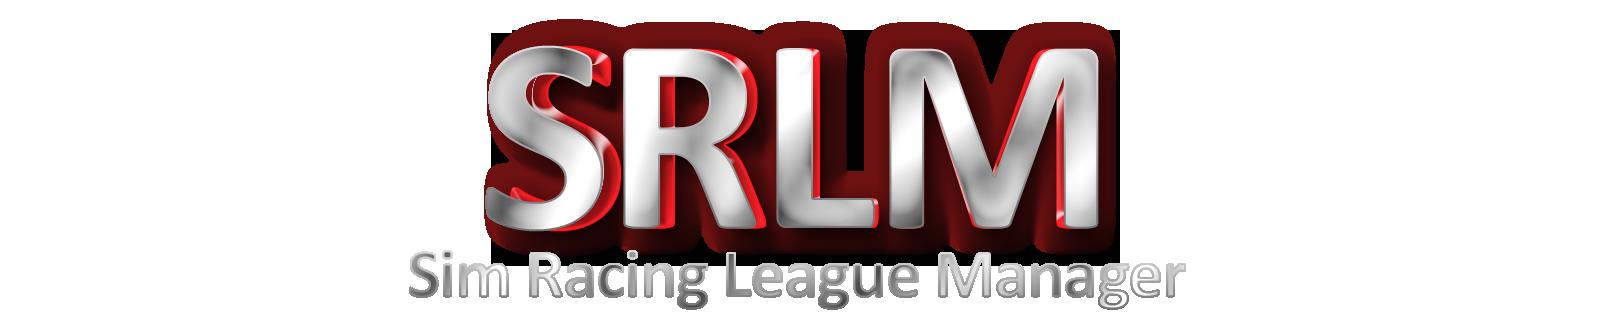 Sim Racing League Manager - SRLM